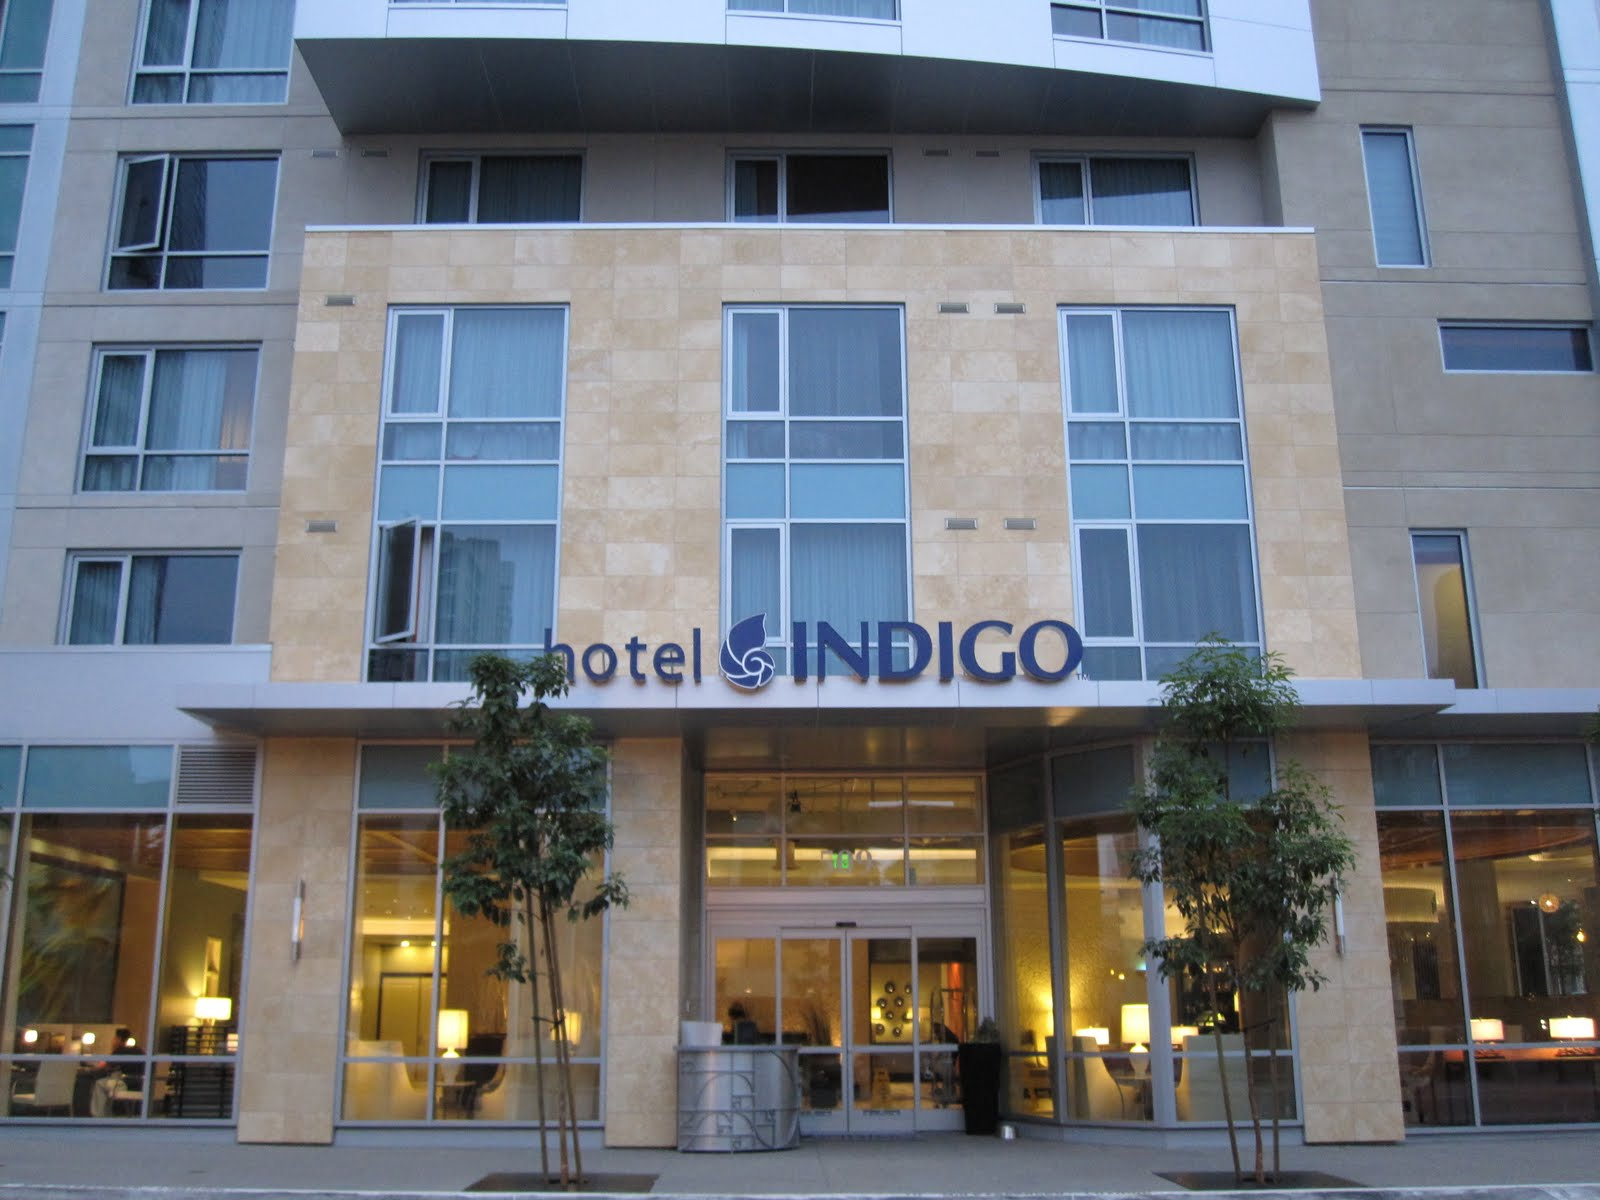 hotel indigo san diego the little yaris diary. Black Bedroom Furniture Sets. Home Design Ideas